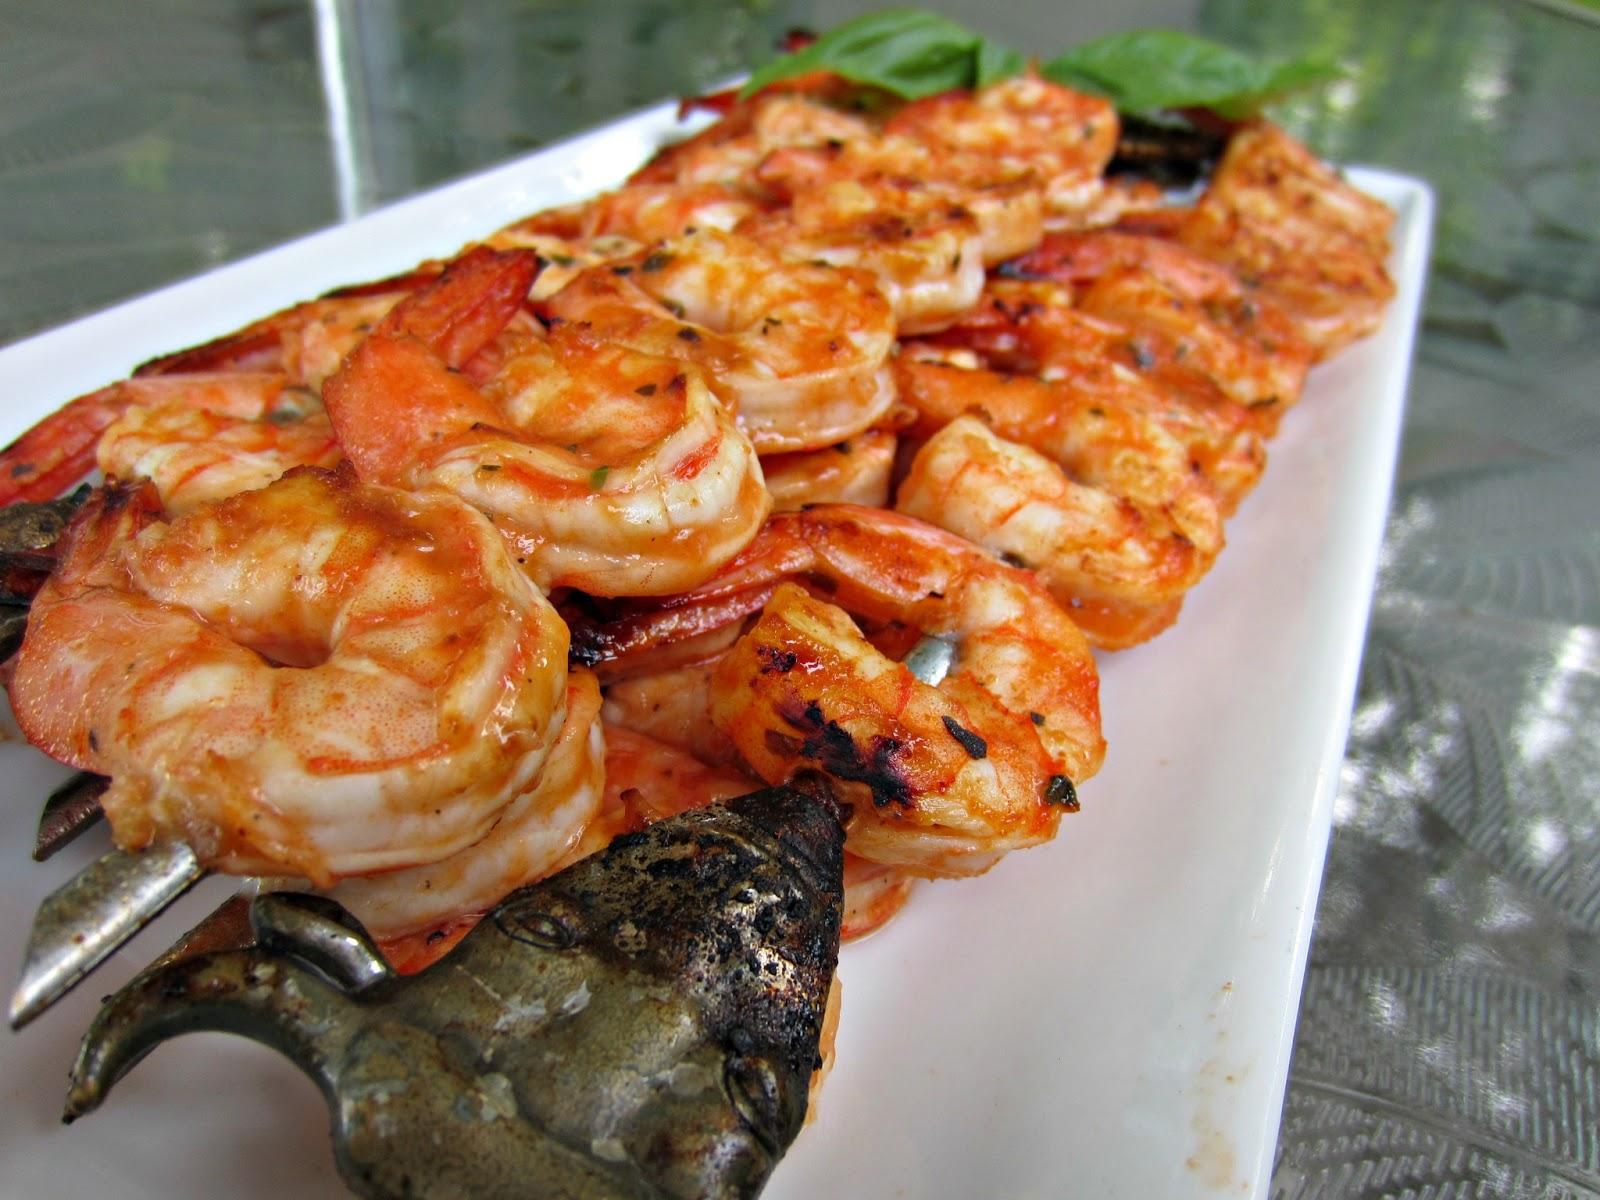 My Kitchen Adventures: Marinated Grilled Shrimp Skewers